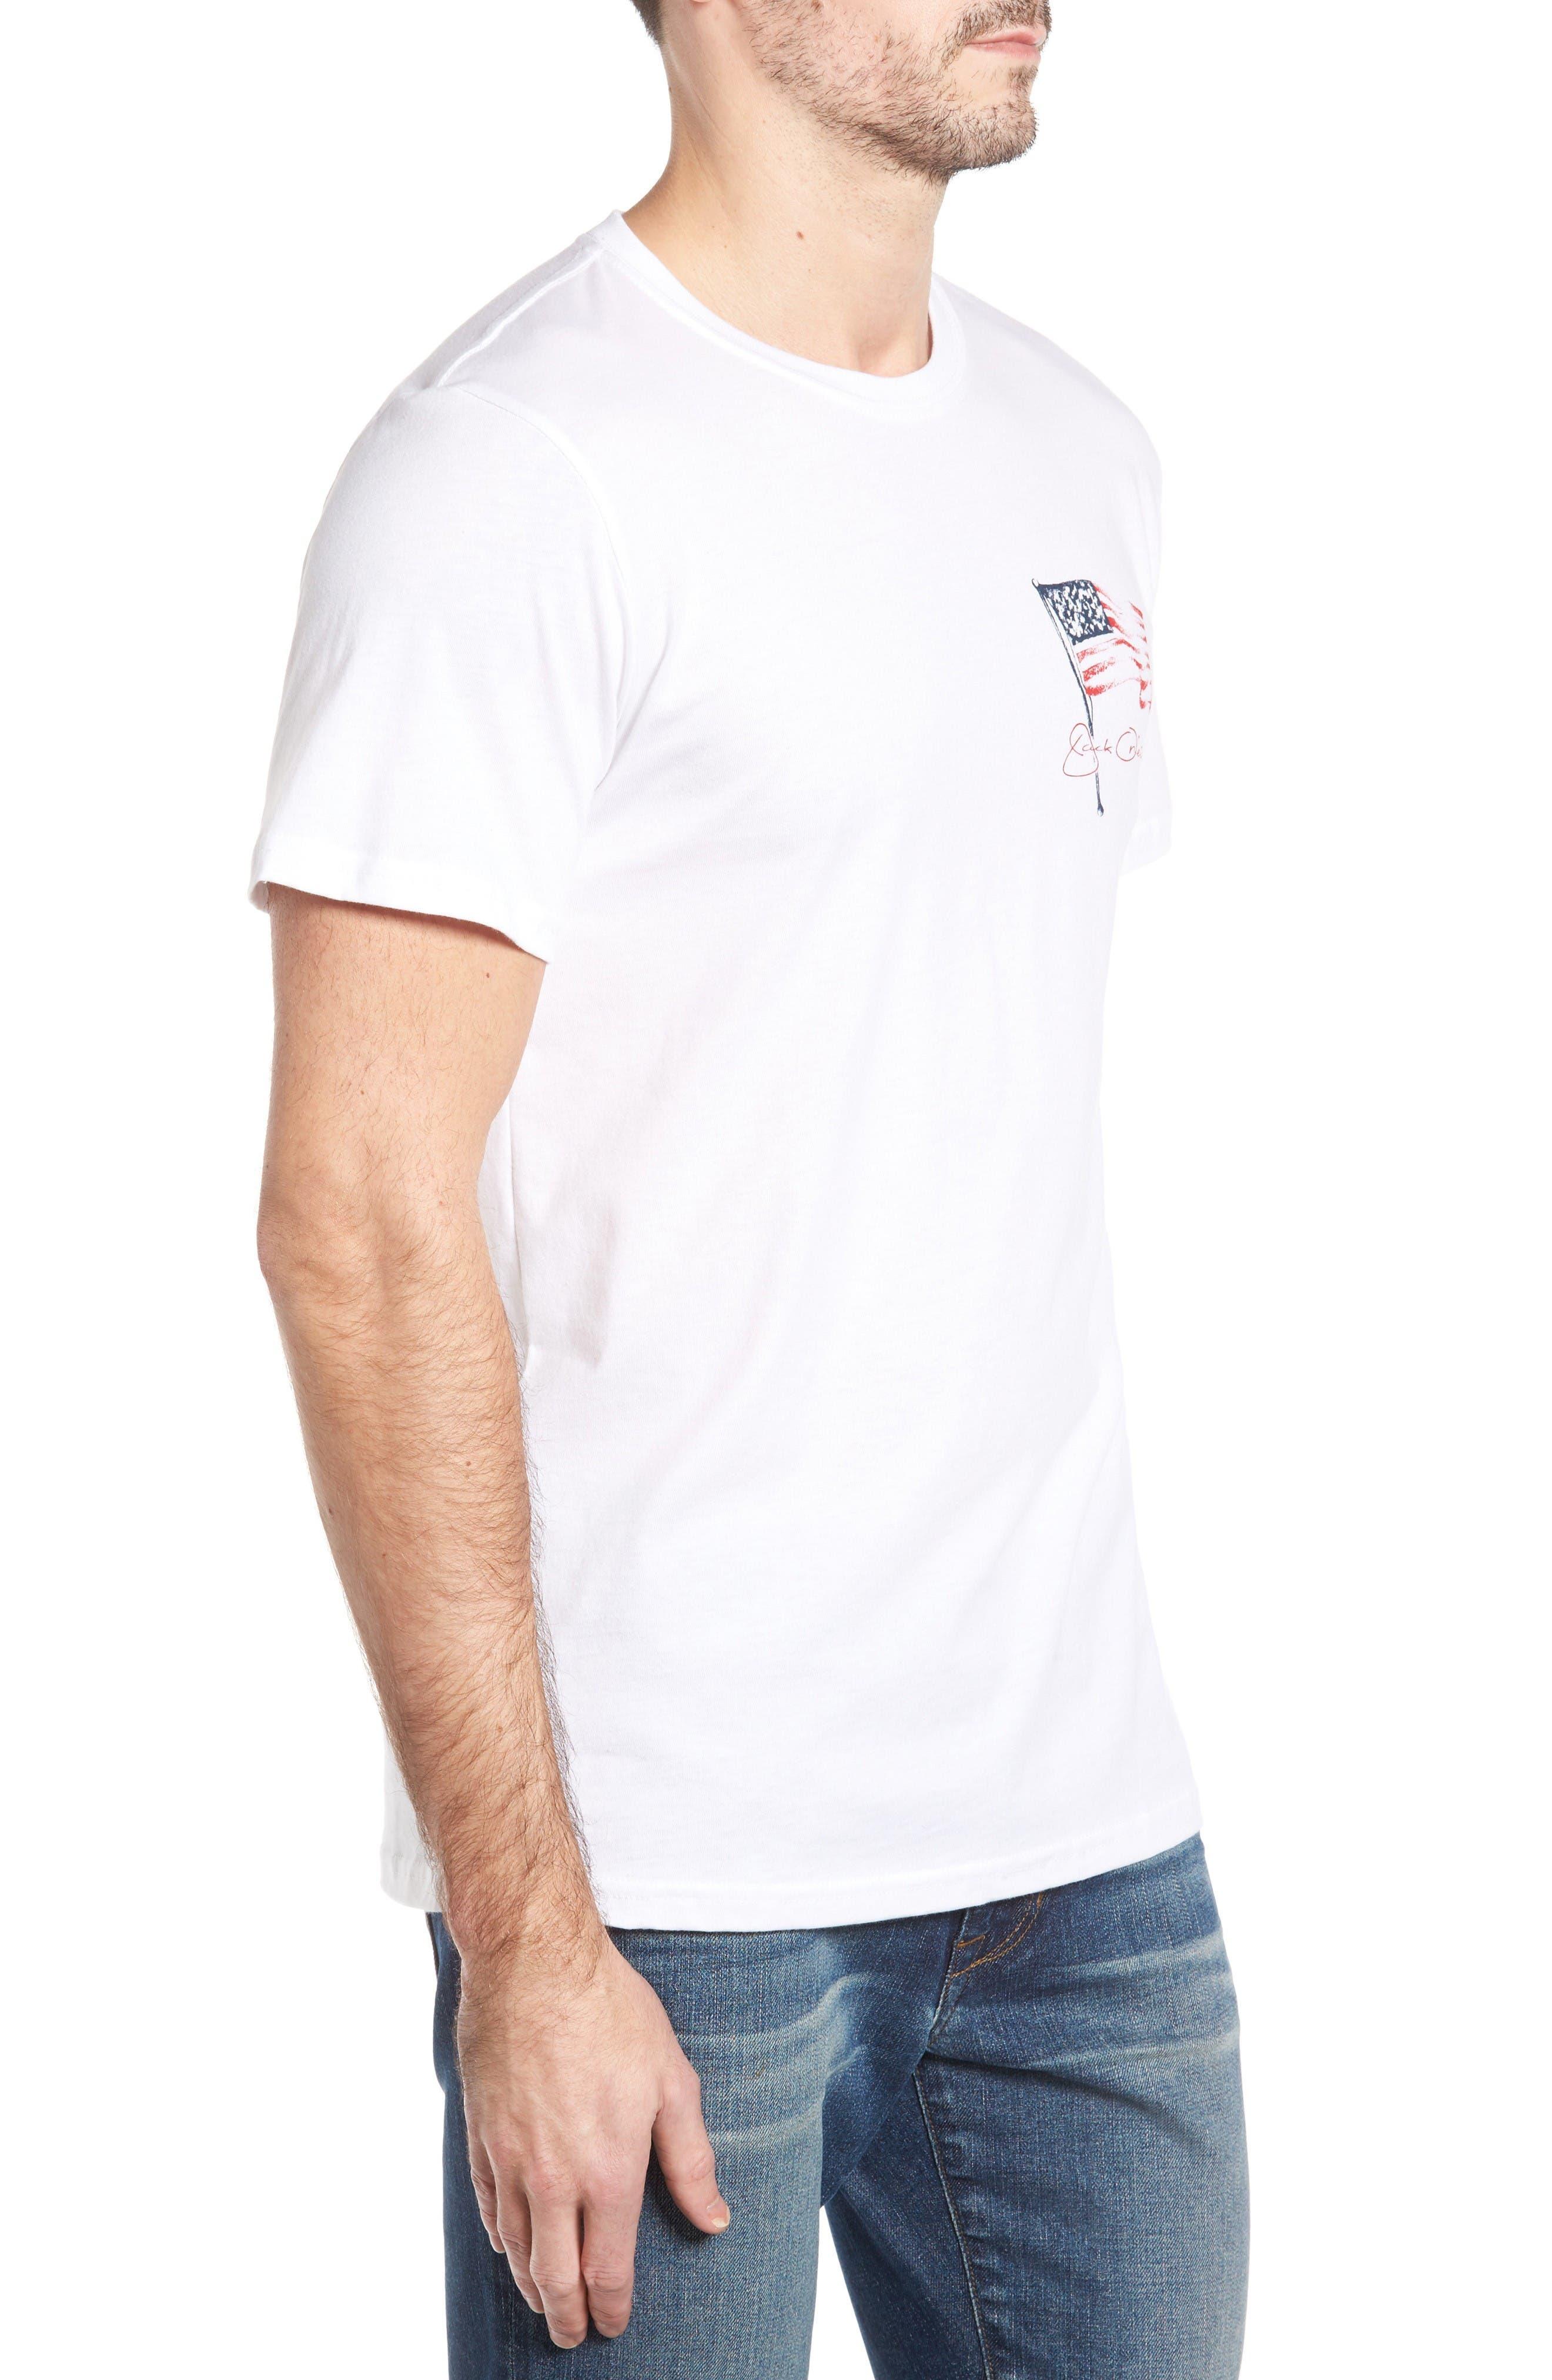 Freedom T-Shirt,                             Alternate thumbnail 3, color,                             White